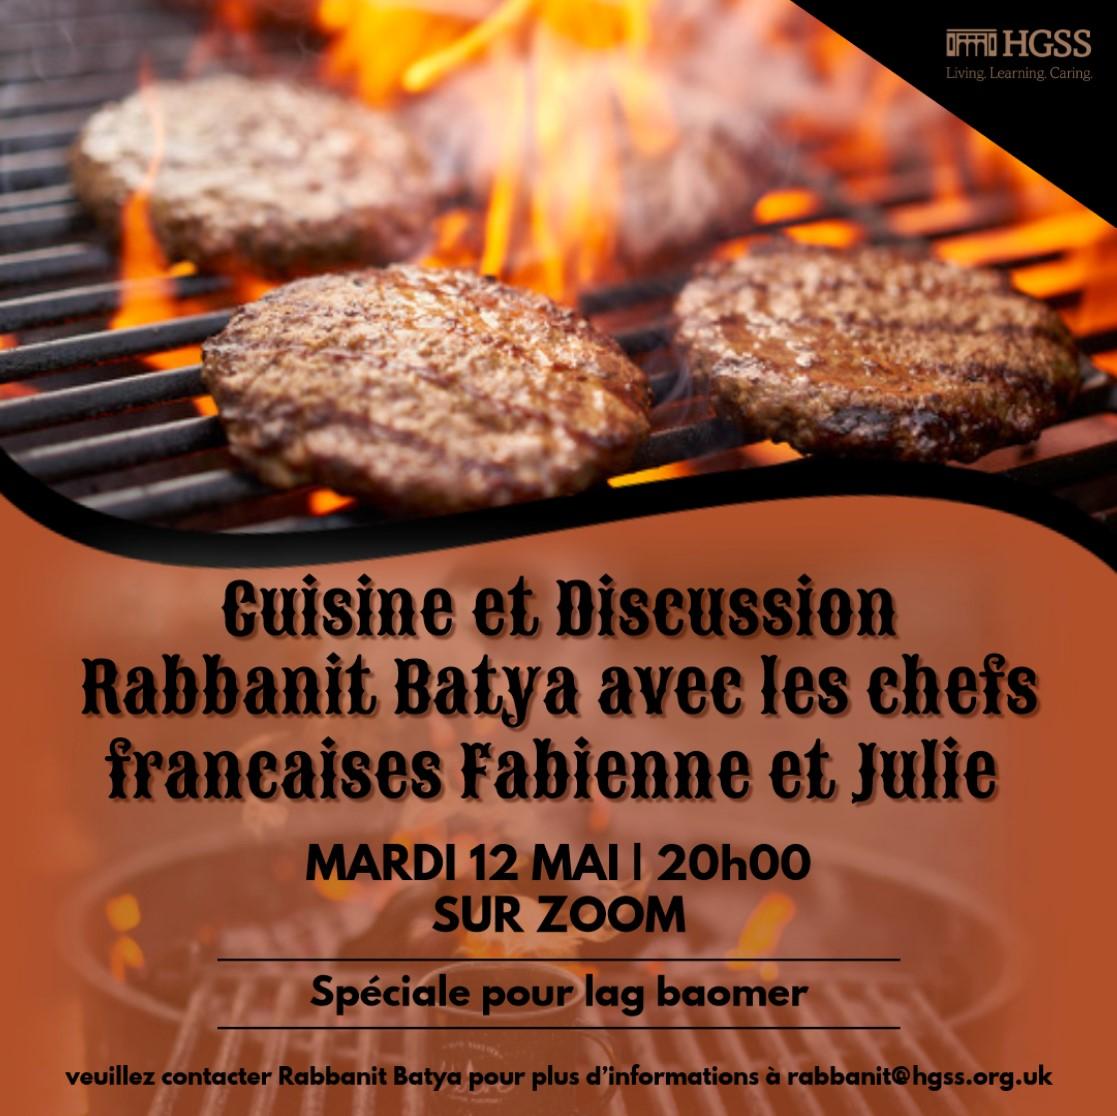 Cuisine et Discussion @ Online (Contact Rabbanit Batya for link)